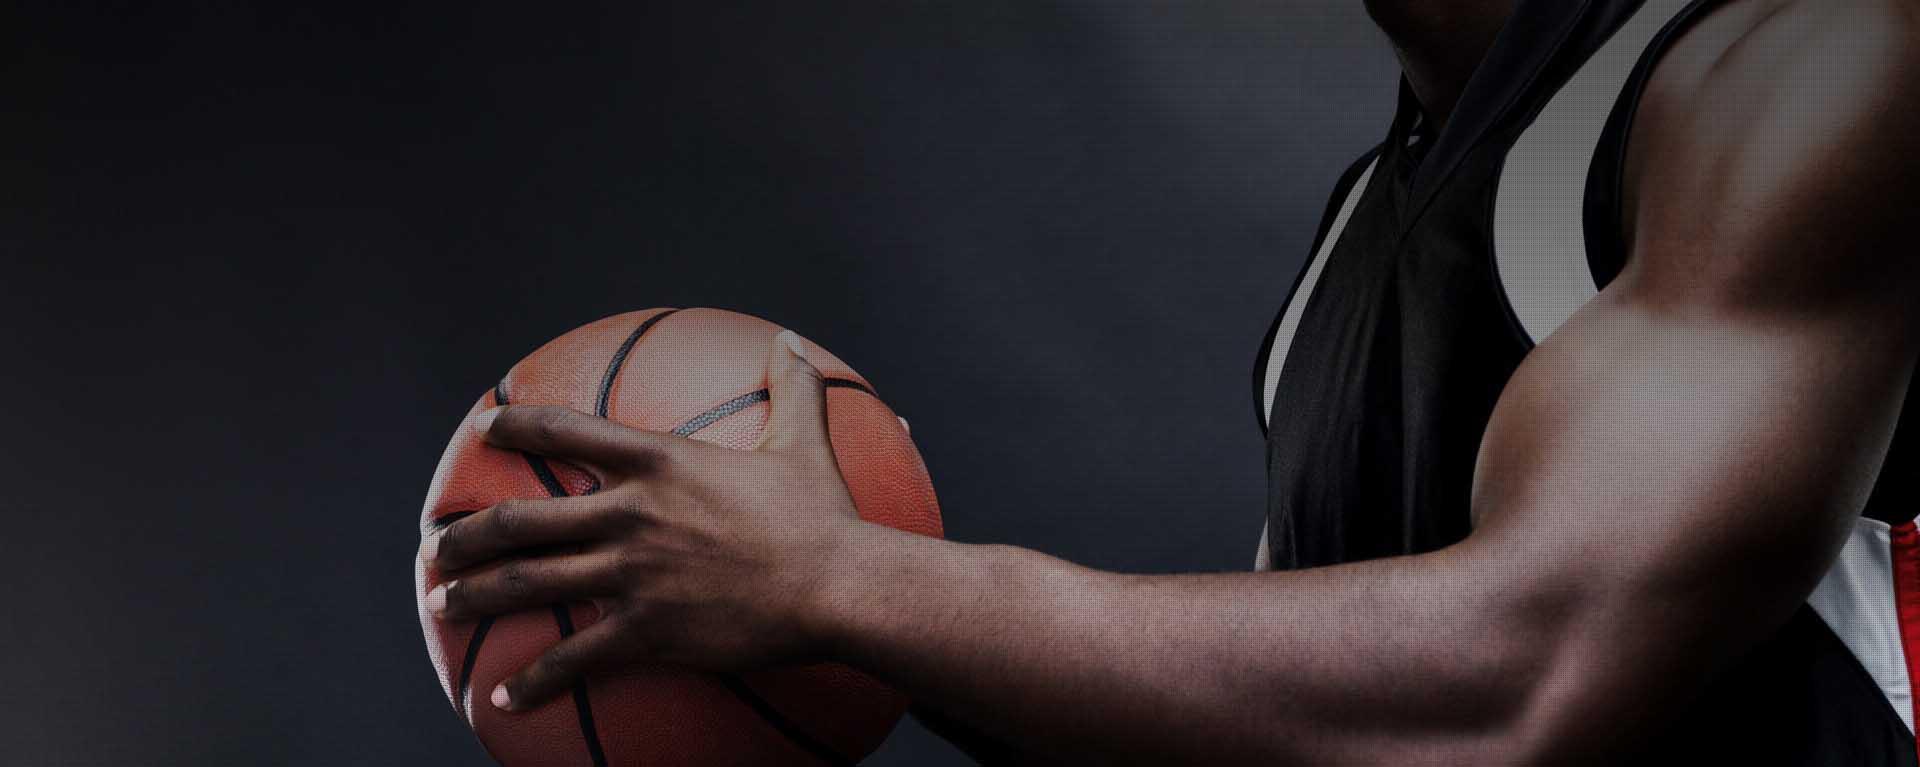 basketball drill